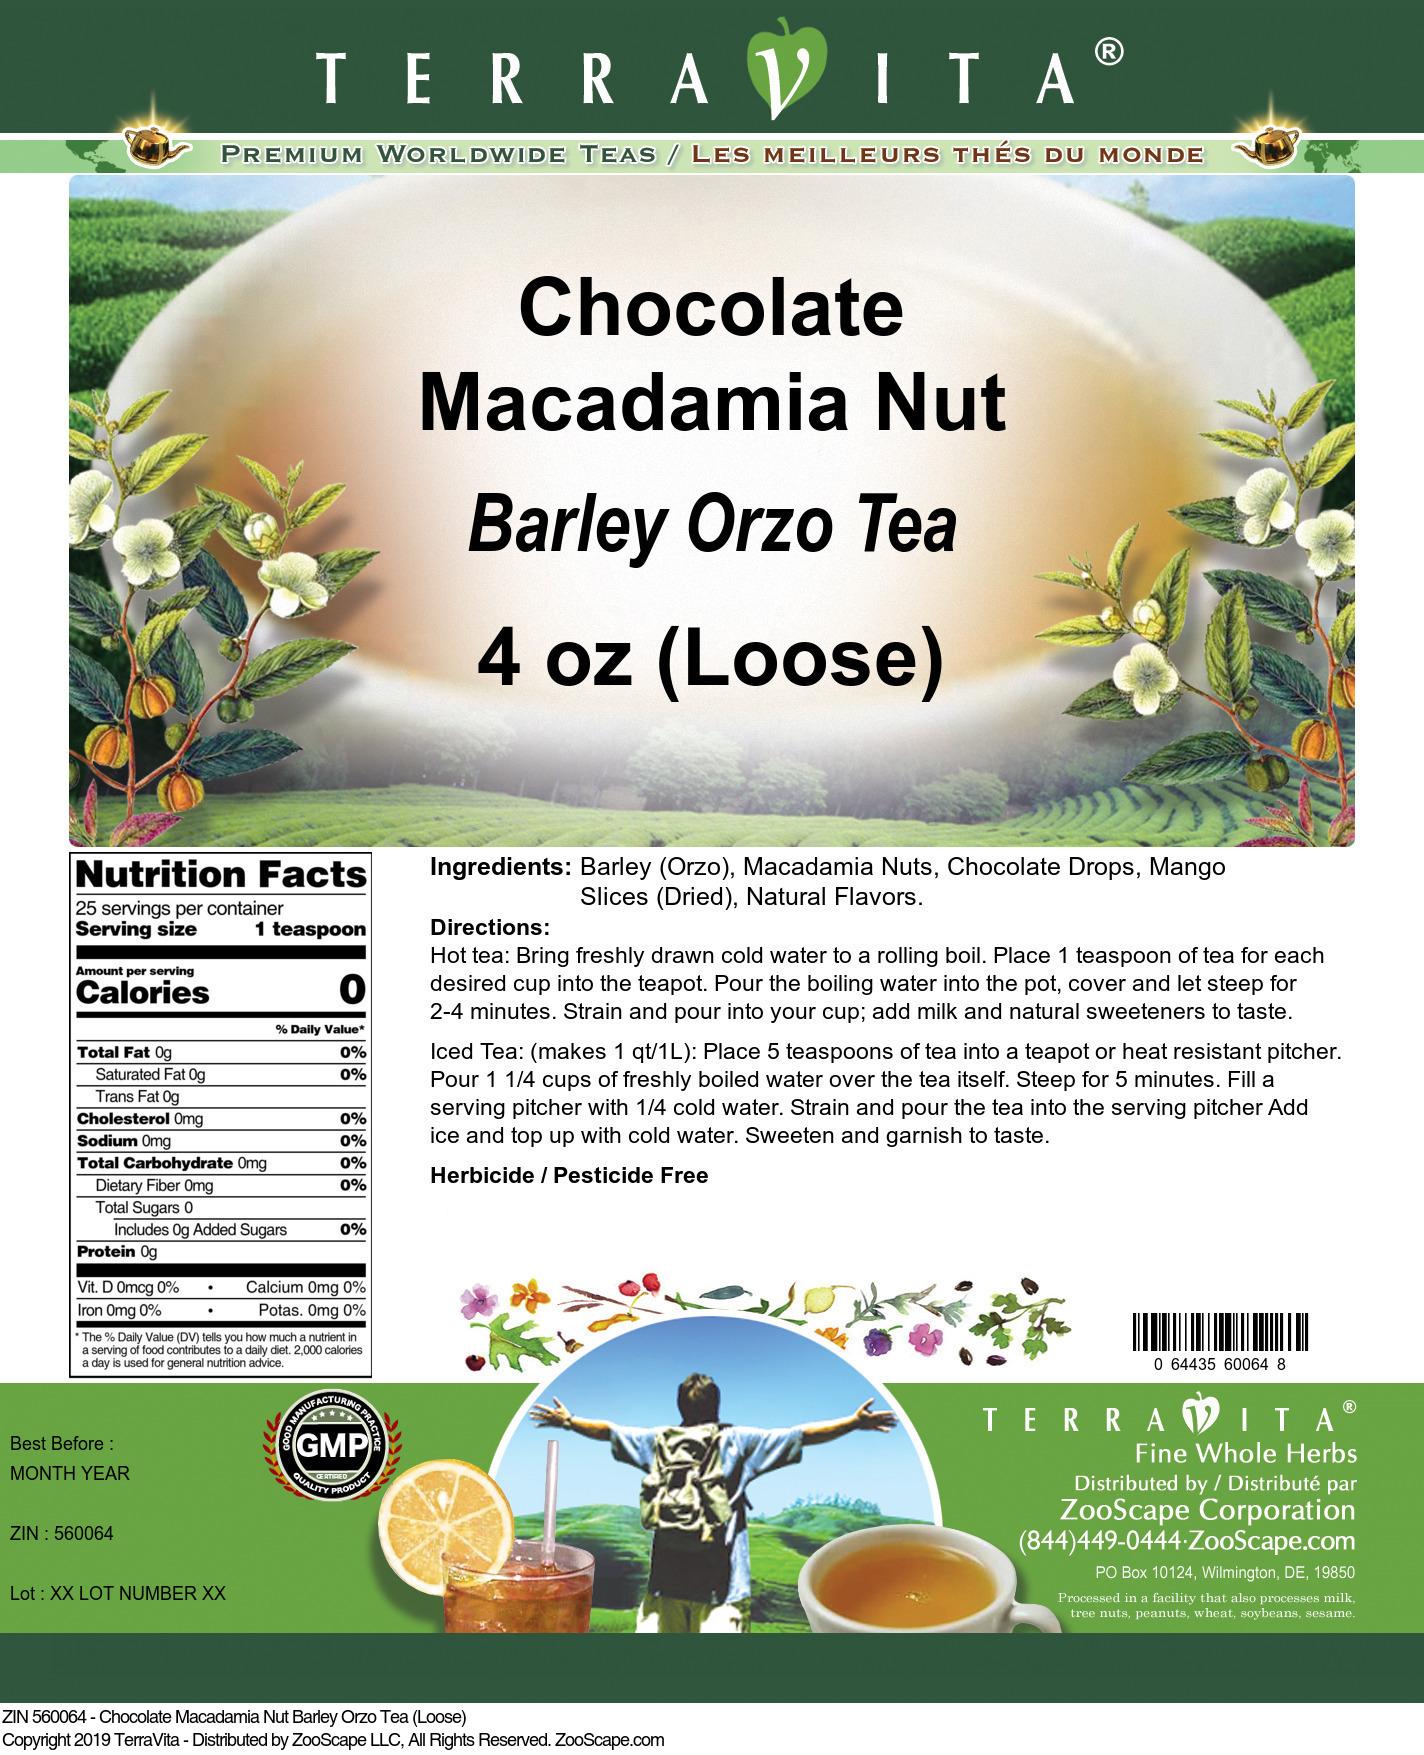 Chocolate Macadamia Nut Barley Orzo